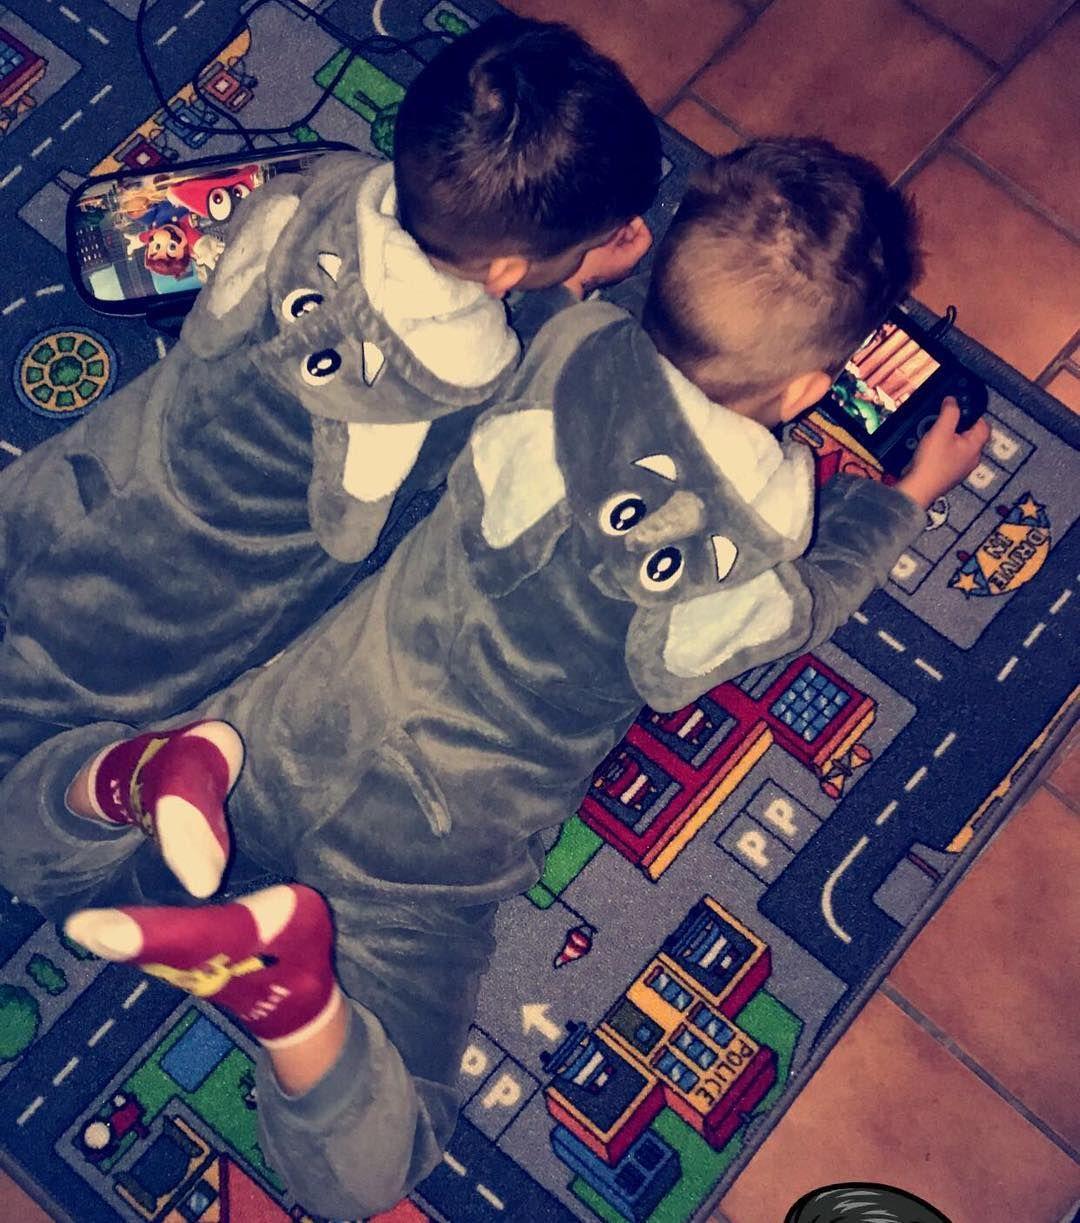 Mes garçons  #malone #kenzo #fils #martos #mom #mommy #maman #fierté #amour #mavie #love #jelesaime #tropdamour #elephant #pyjama #switch #nintendo #nintendoswitch #jadore#mesbebes#2019 #son #amor #pokemon #mario #marioodyssey #baby #babyboy #boy #petitmec